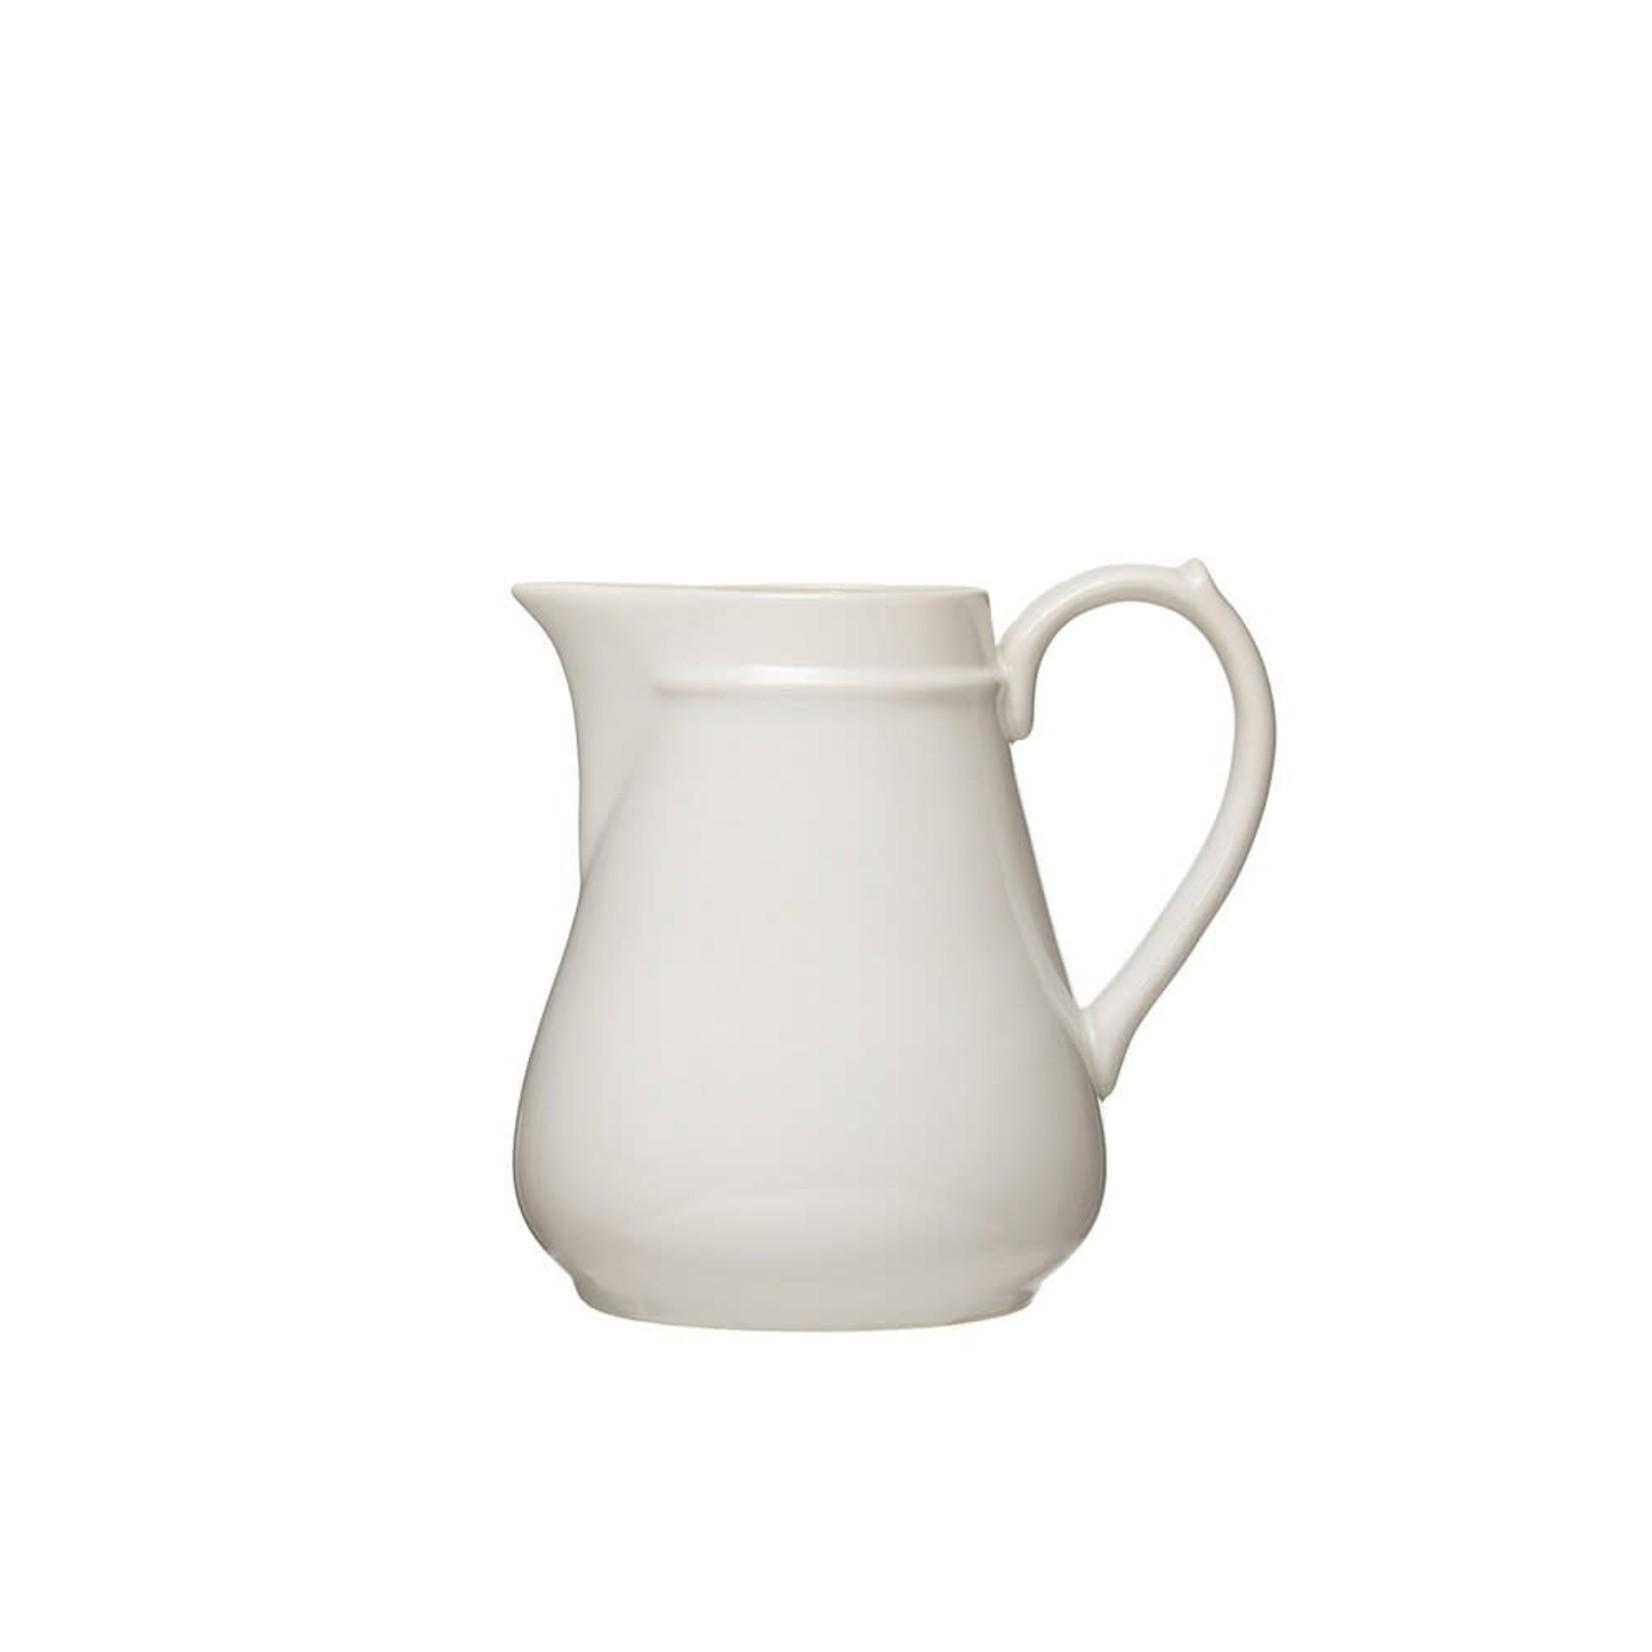 White Vintage Reproduction Stoneware Pitcher